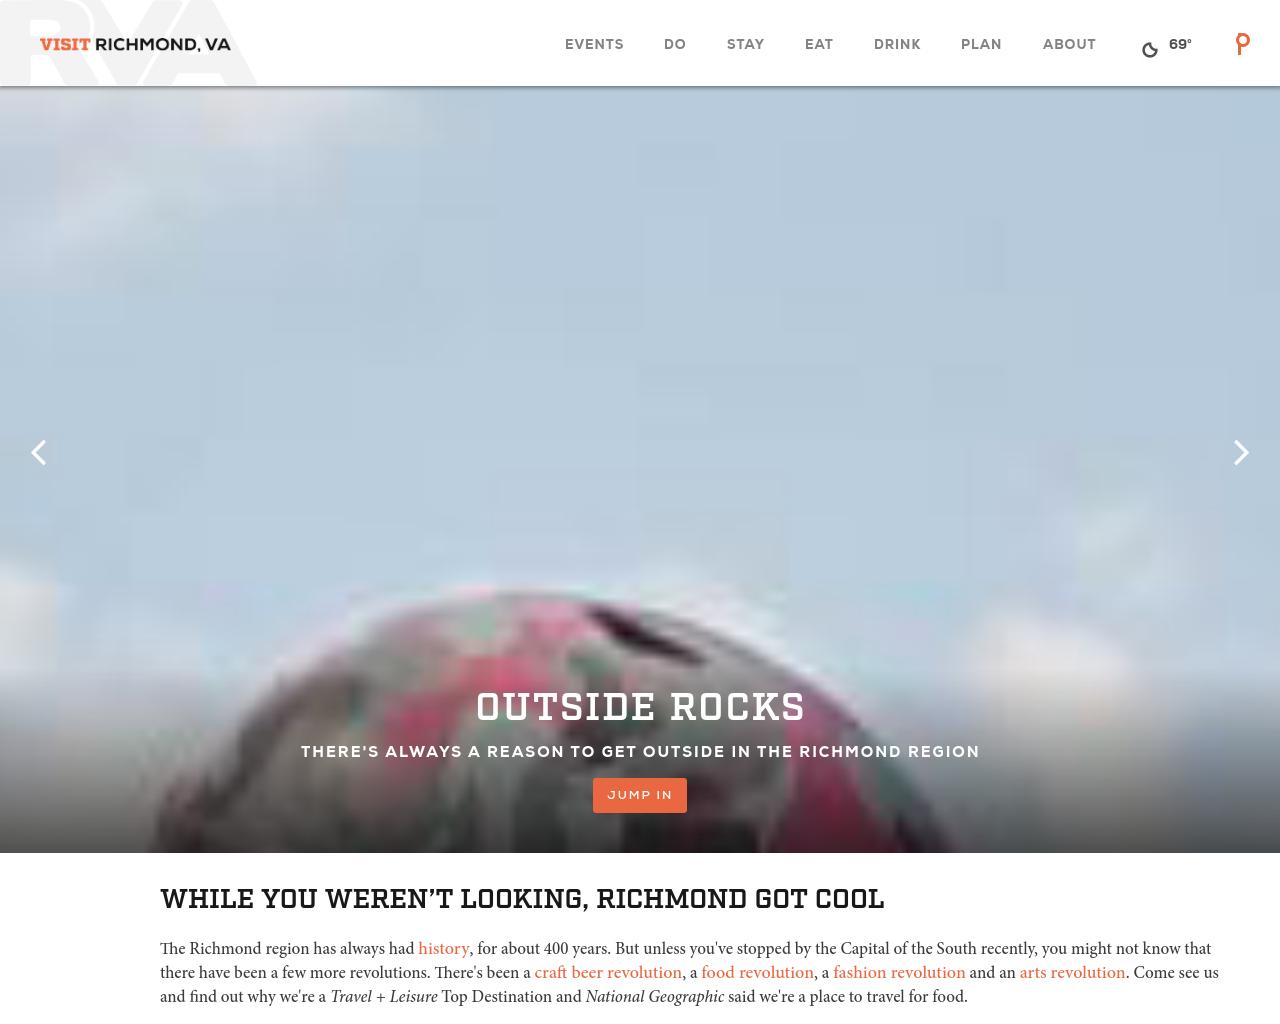 Visit-Richmond-VA-Advertising-Reviews-Pricing